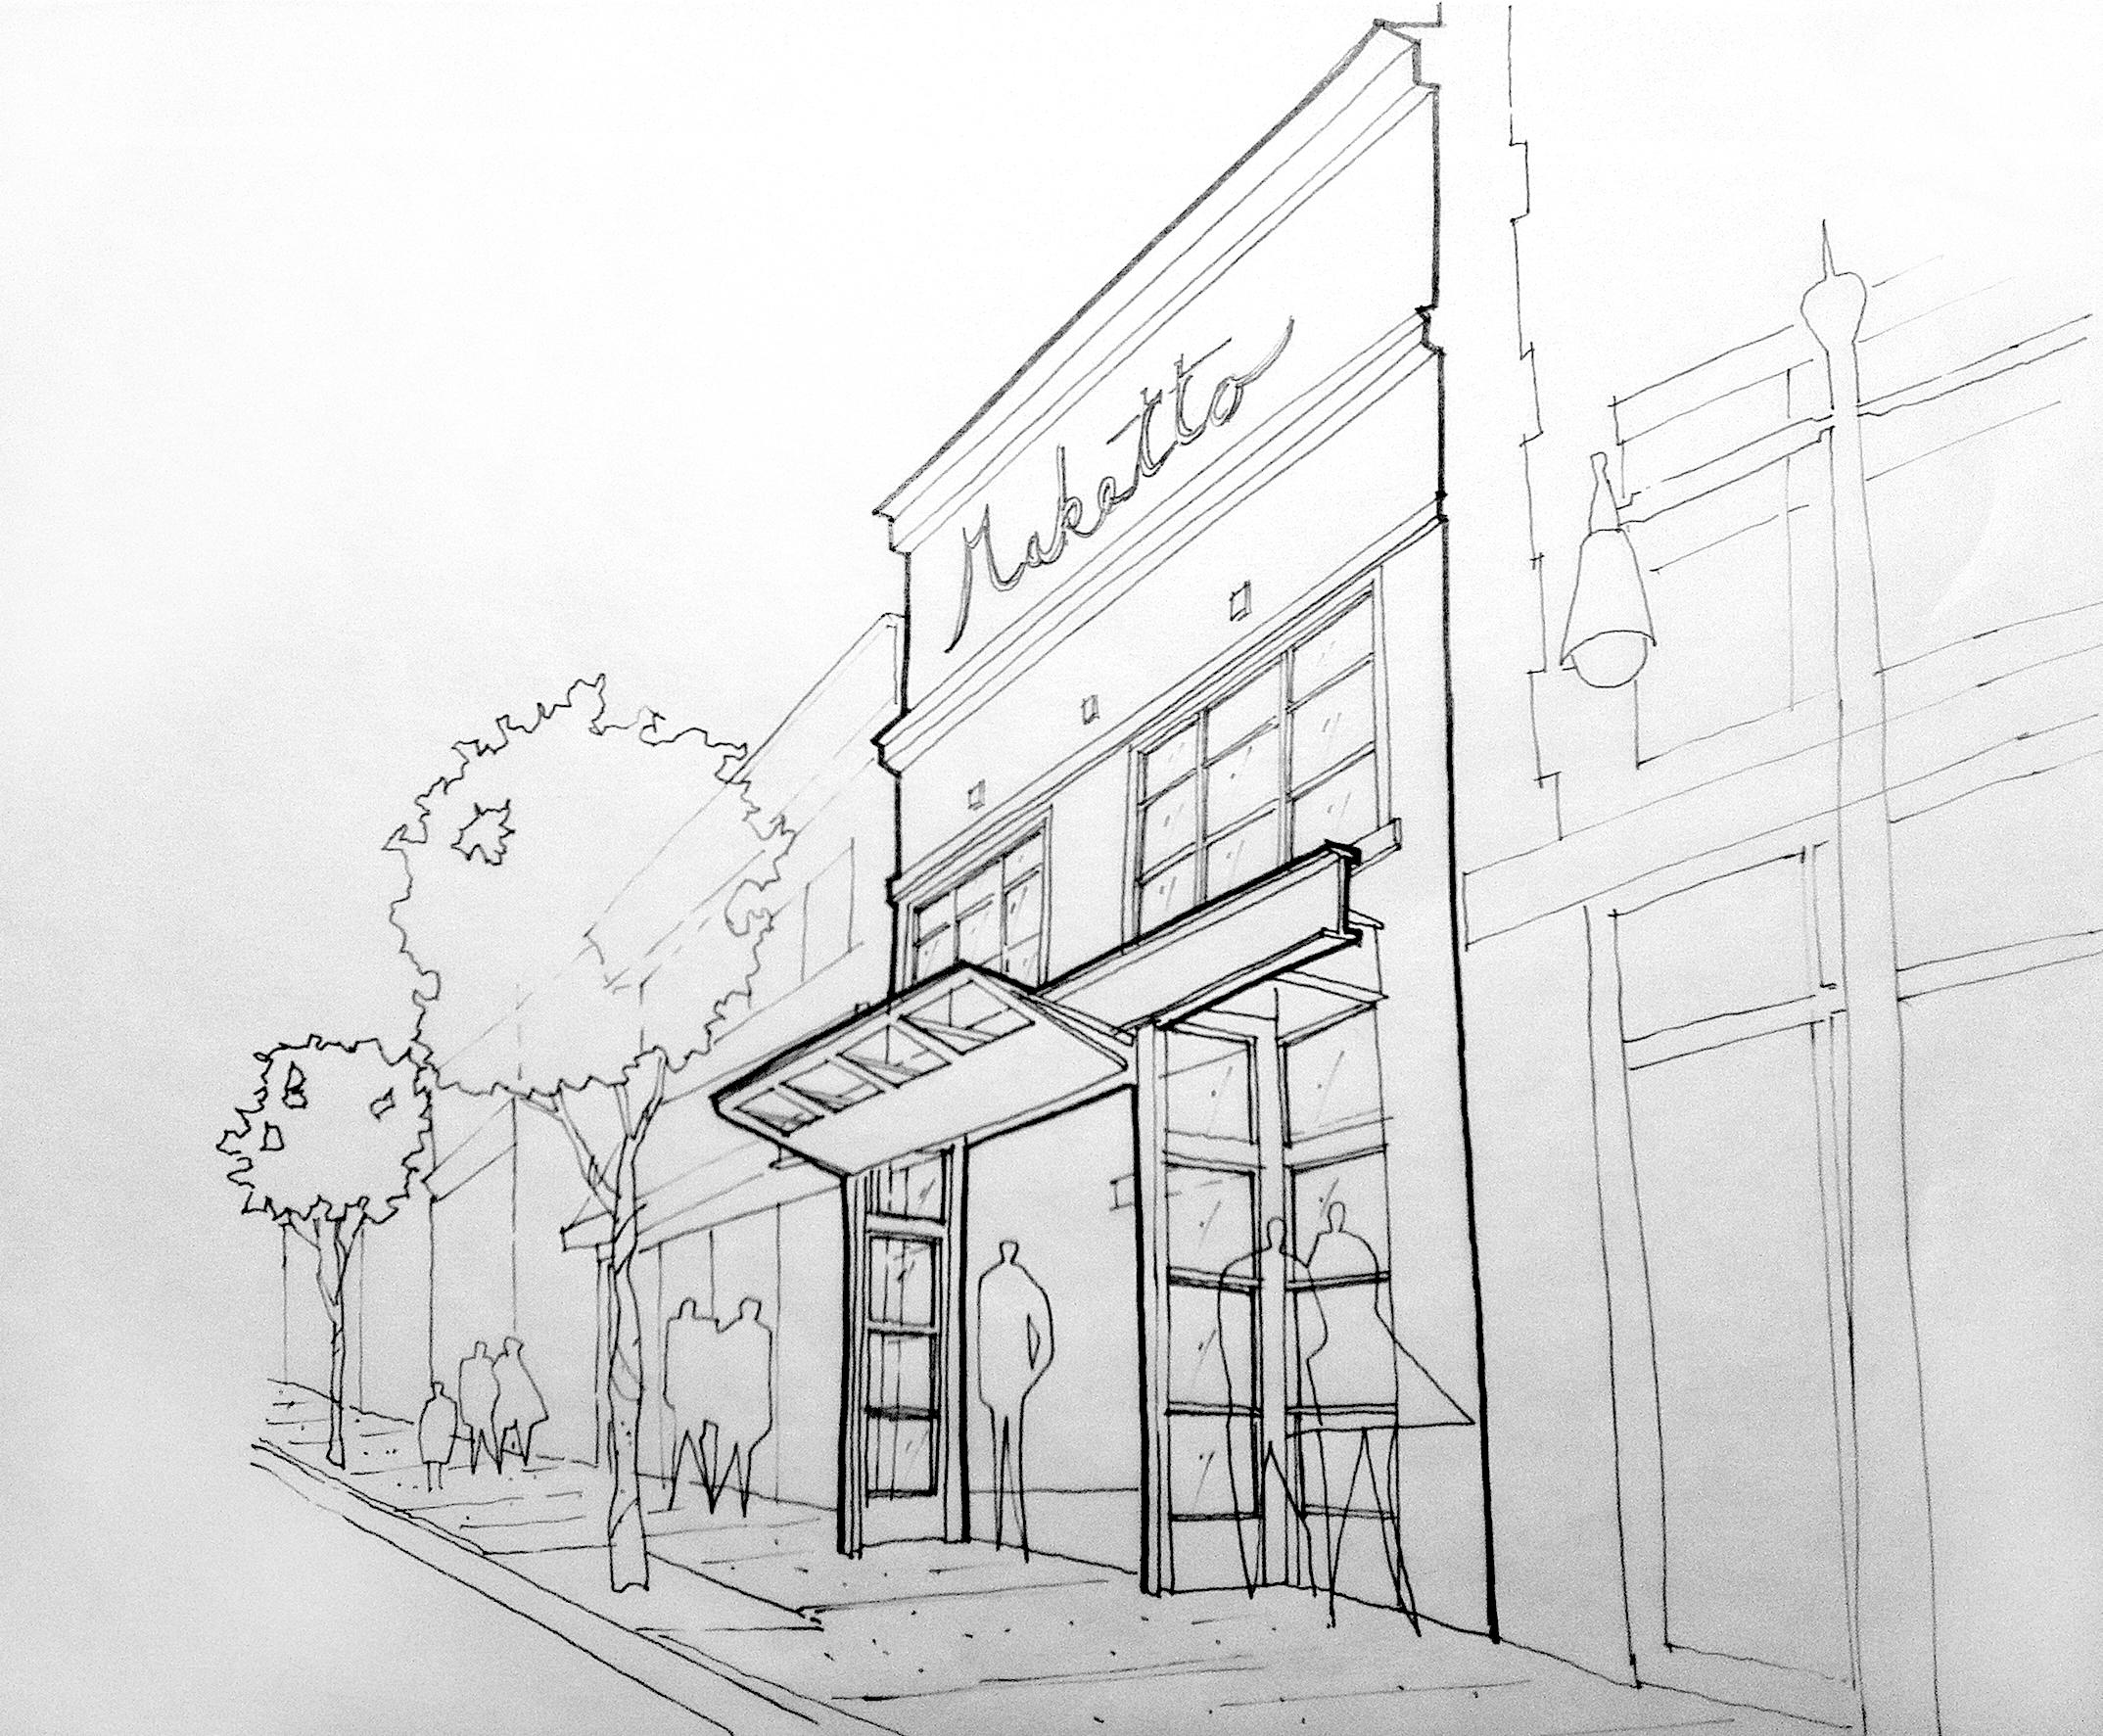 studio-saint-bars-and-restaurants-maketto-washington-dc-sketch-1